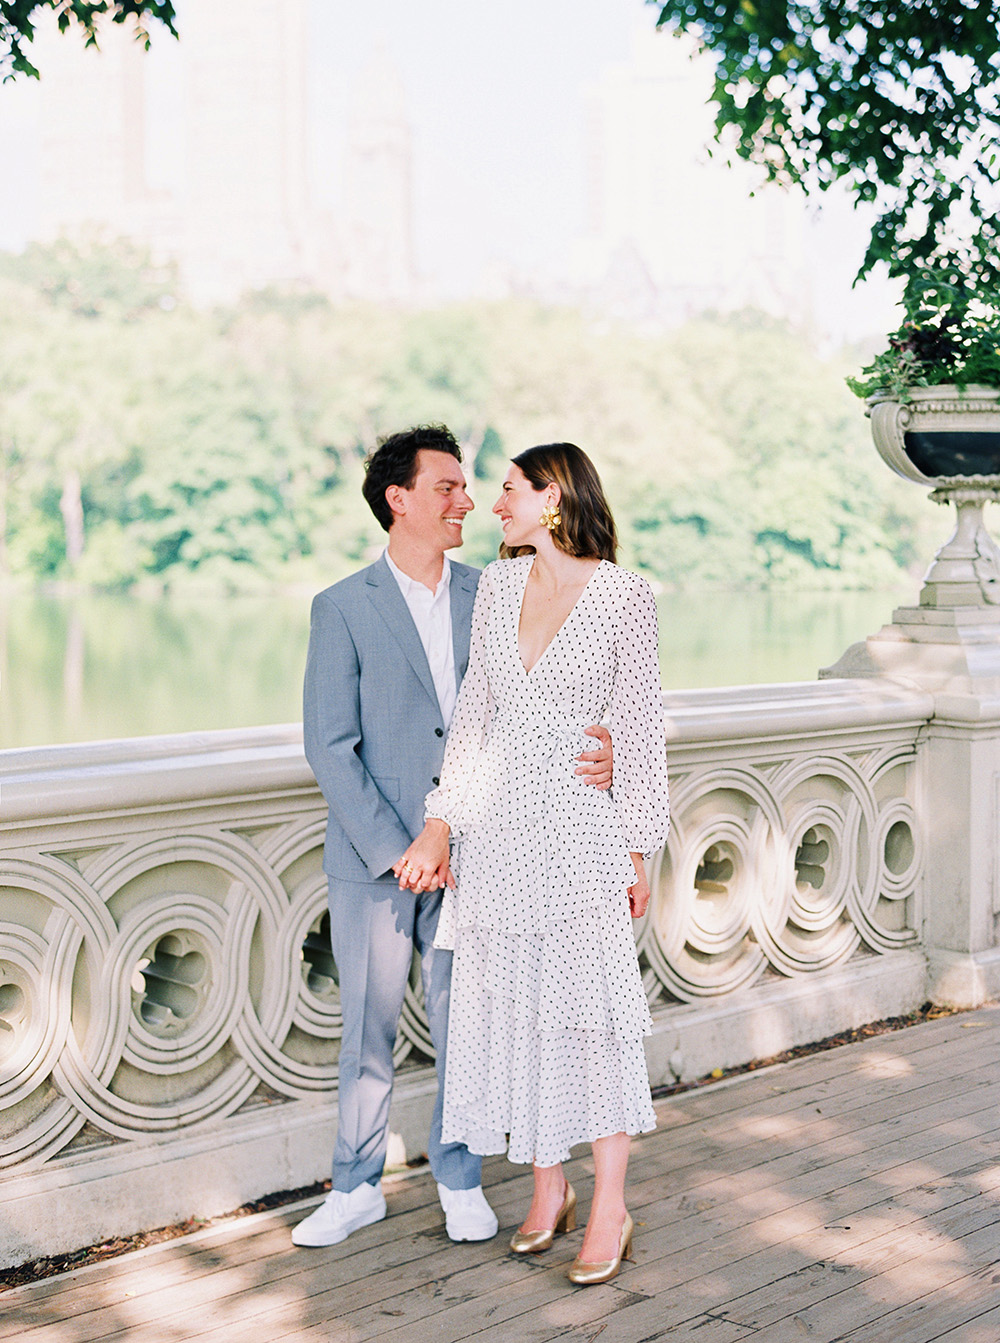 Emilee & Patrick Central Park 3.jpg